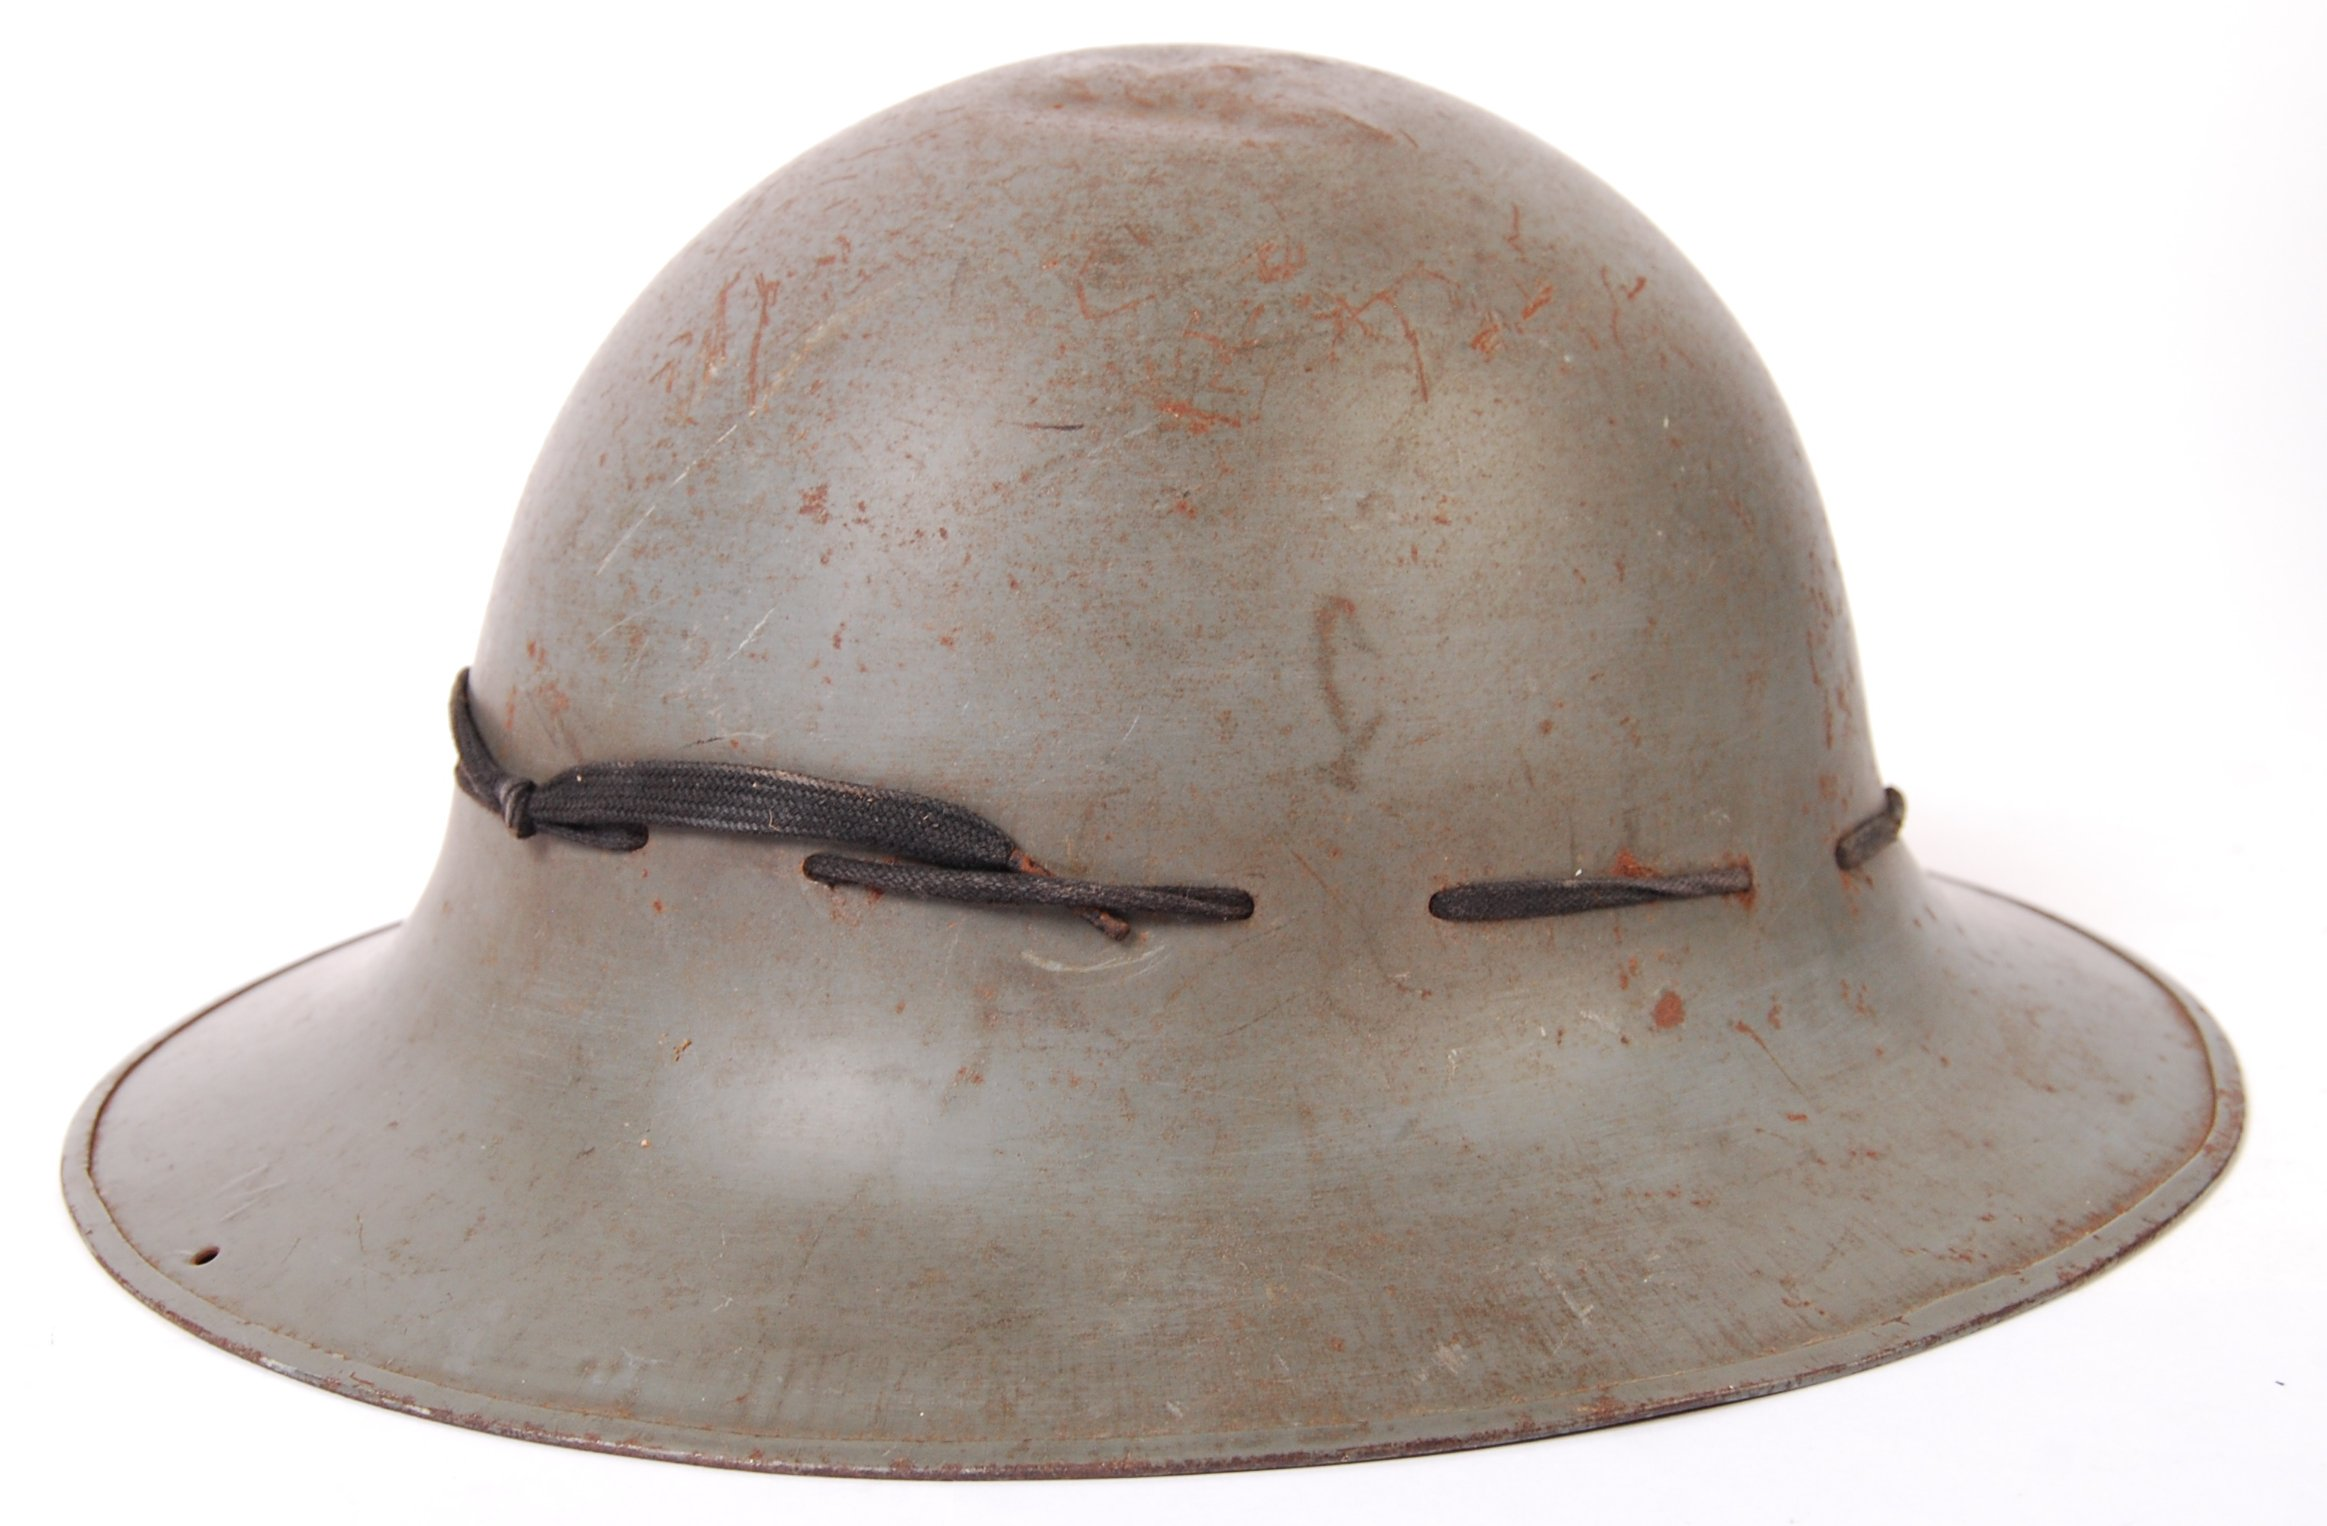 Lot 138 - WWII SECOND WORLD WAR ZUCKERMAN CIVIL DEFENCE HELMET